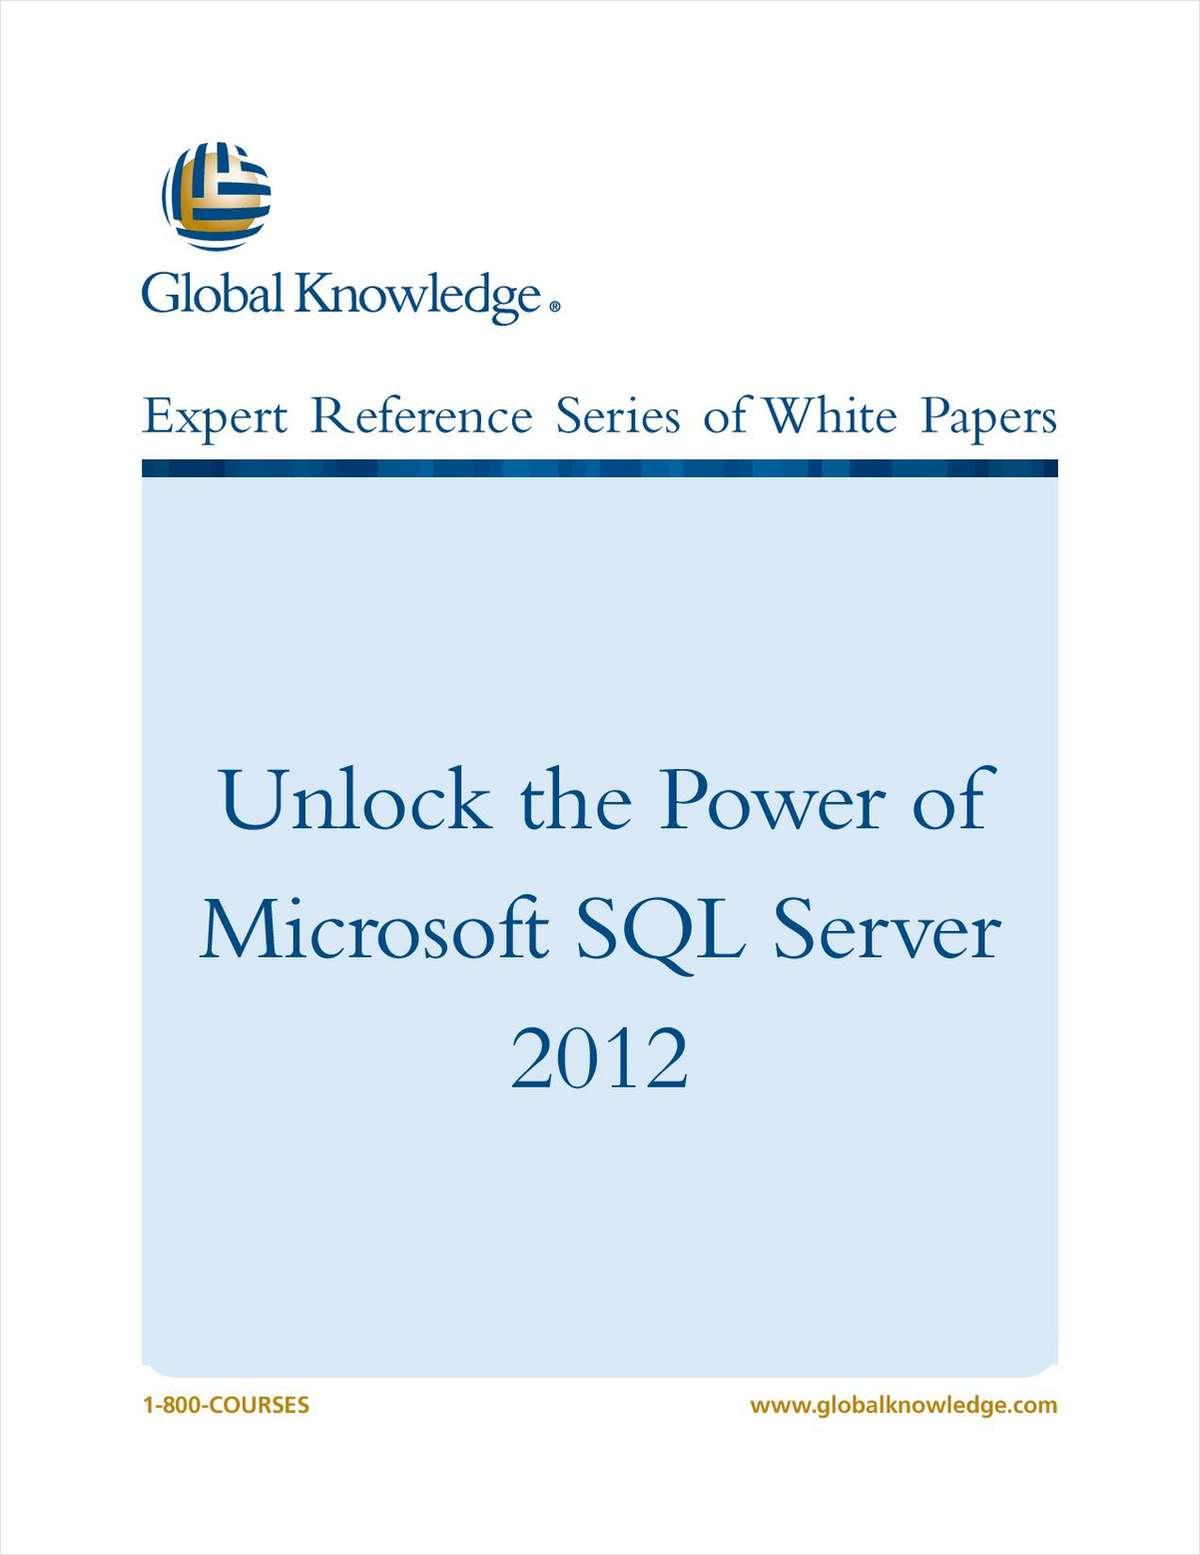 Unlock the Power of Microsoft SQL Server 2012